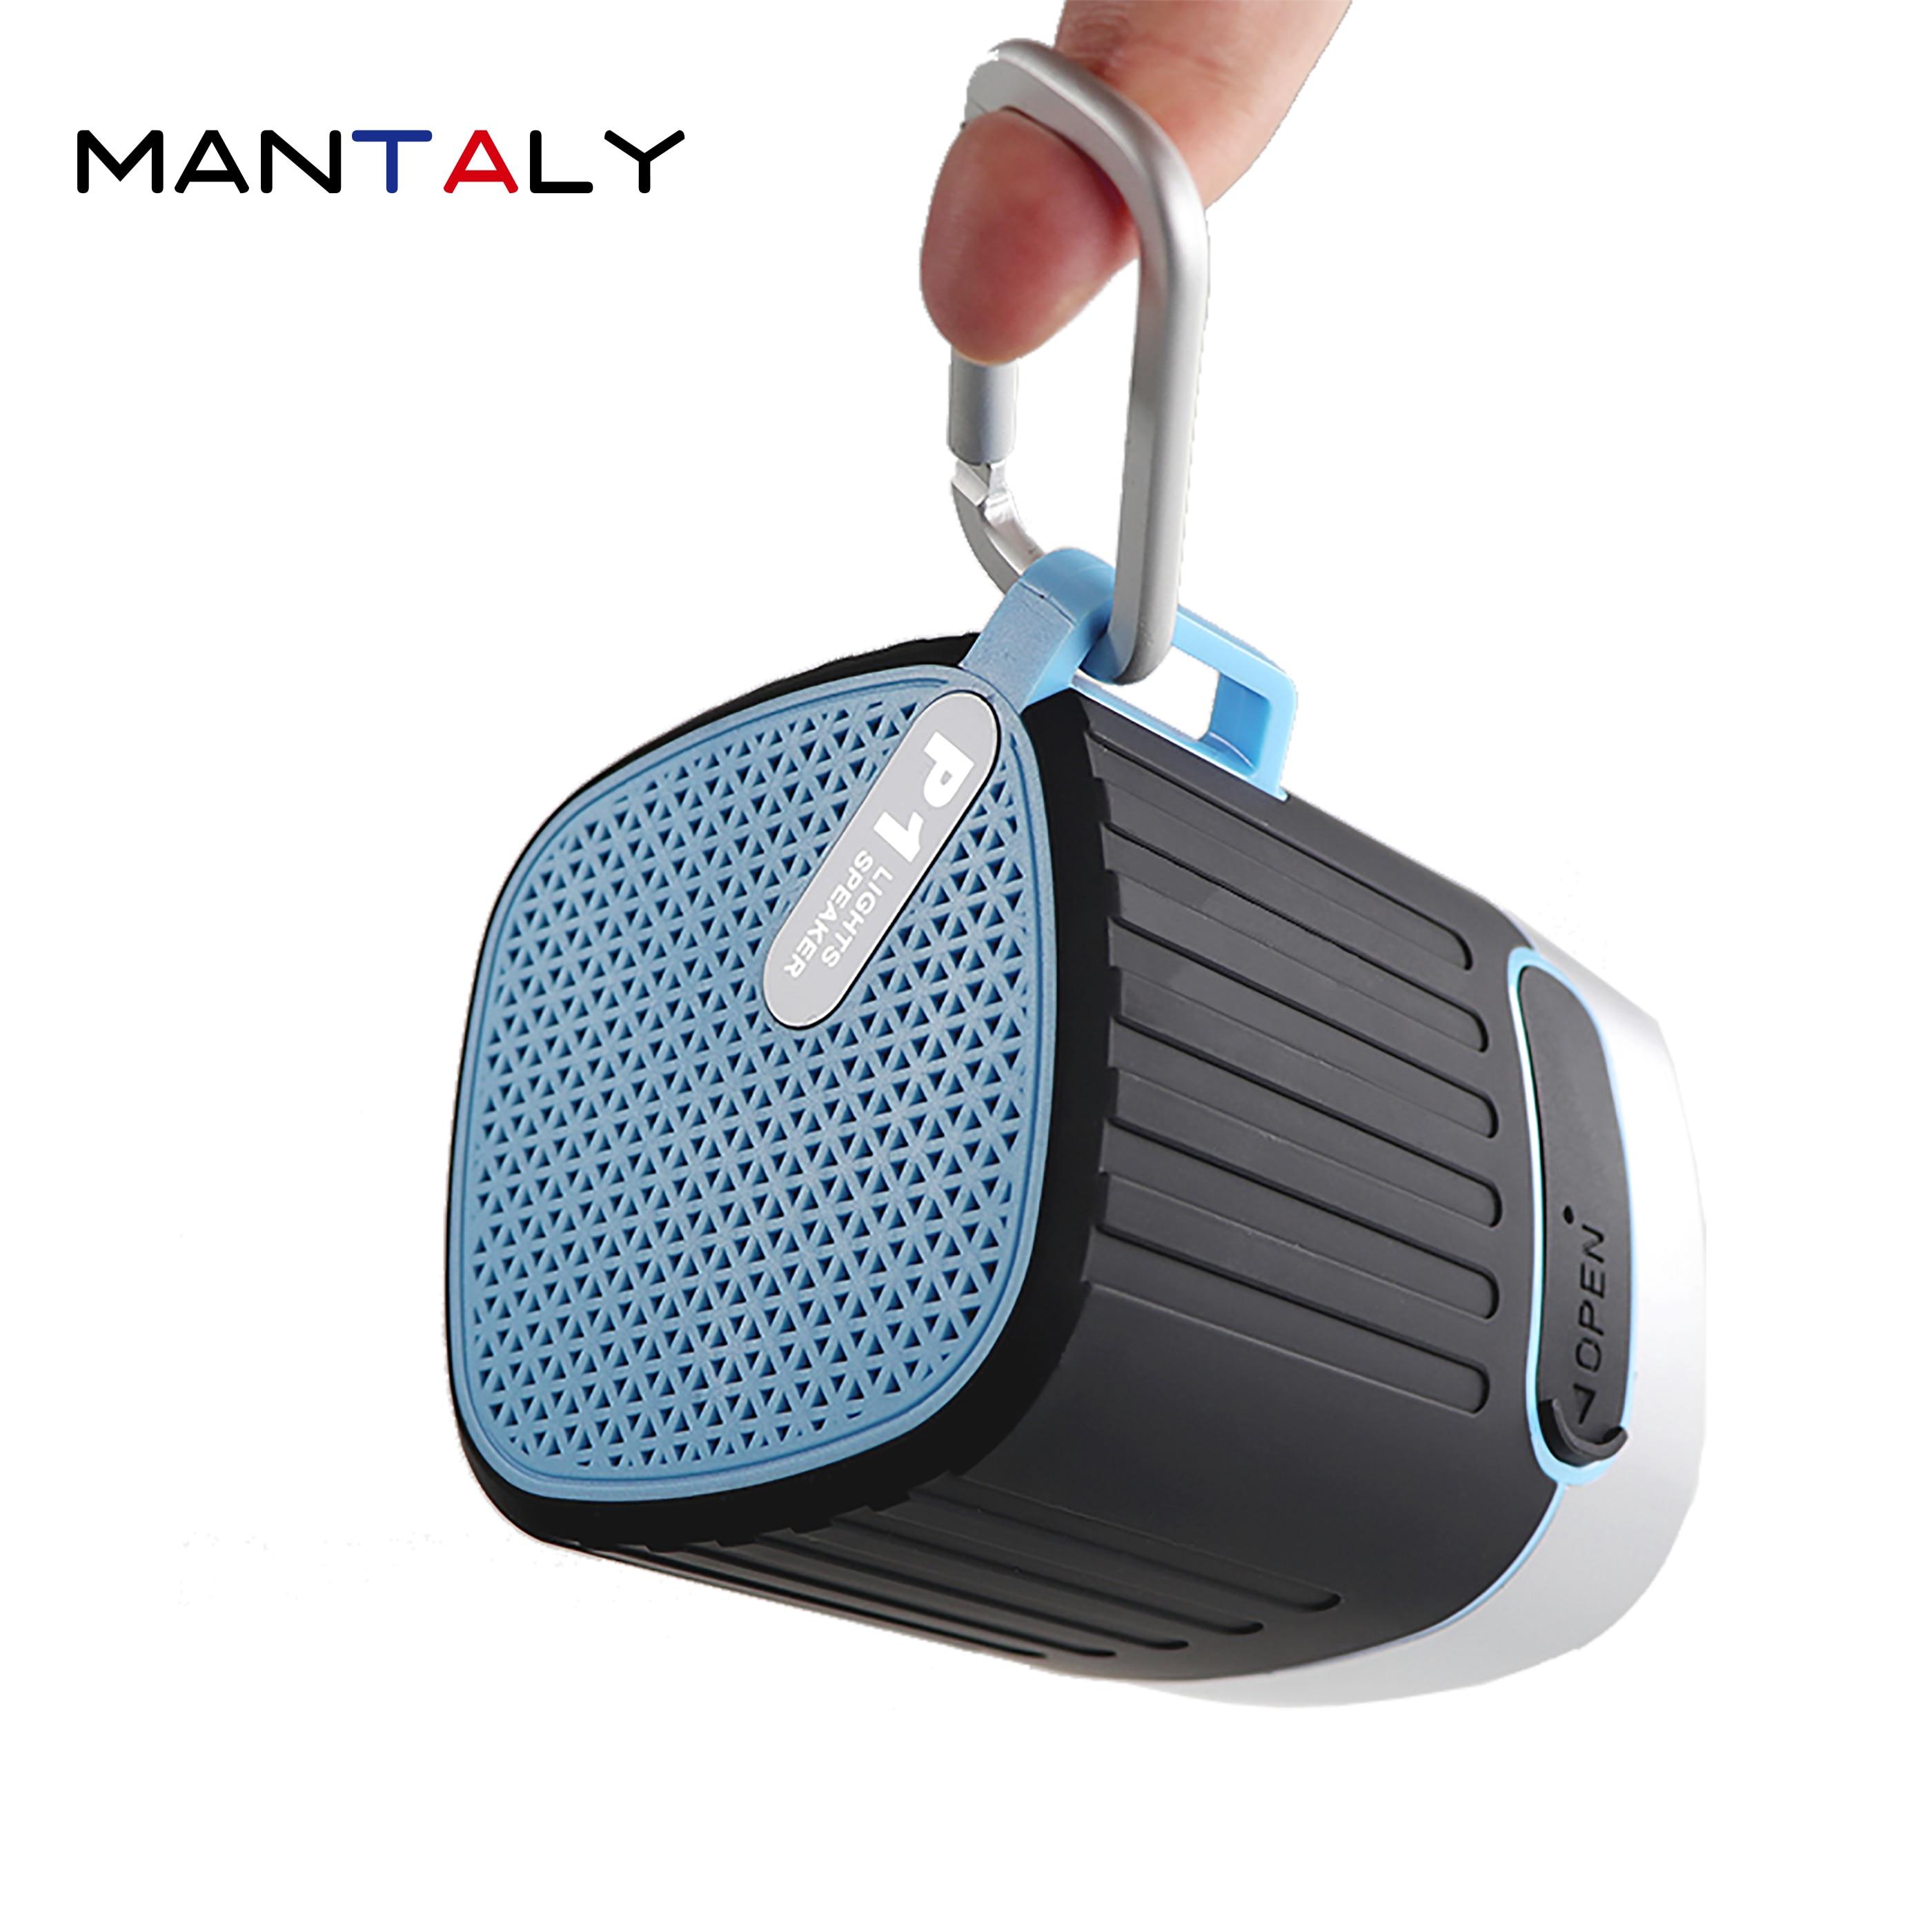 P1 mini Altavoz bluetooth inalámbrico portátil parlante spotify ordenador retro premium boombox azul USB con forma de diente